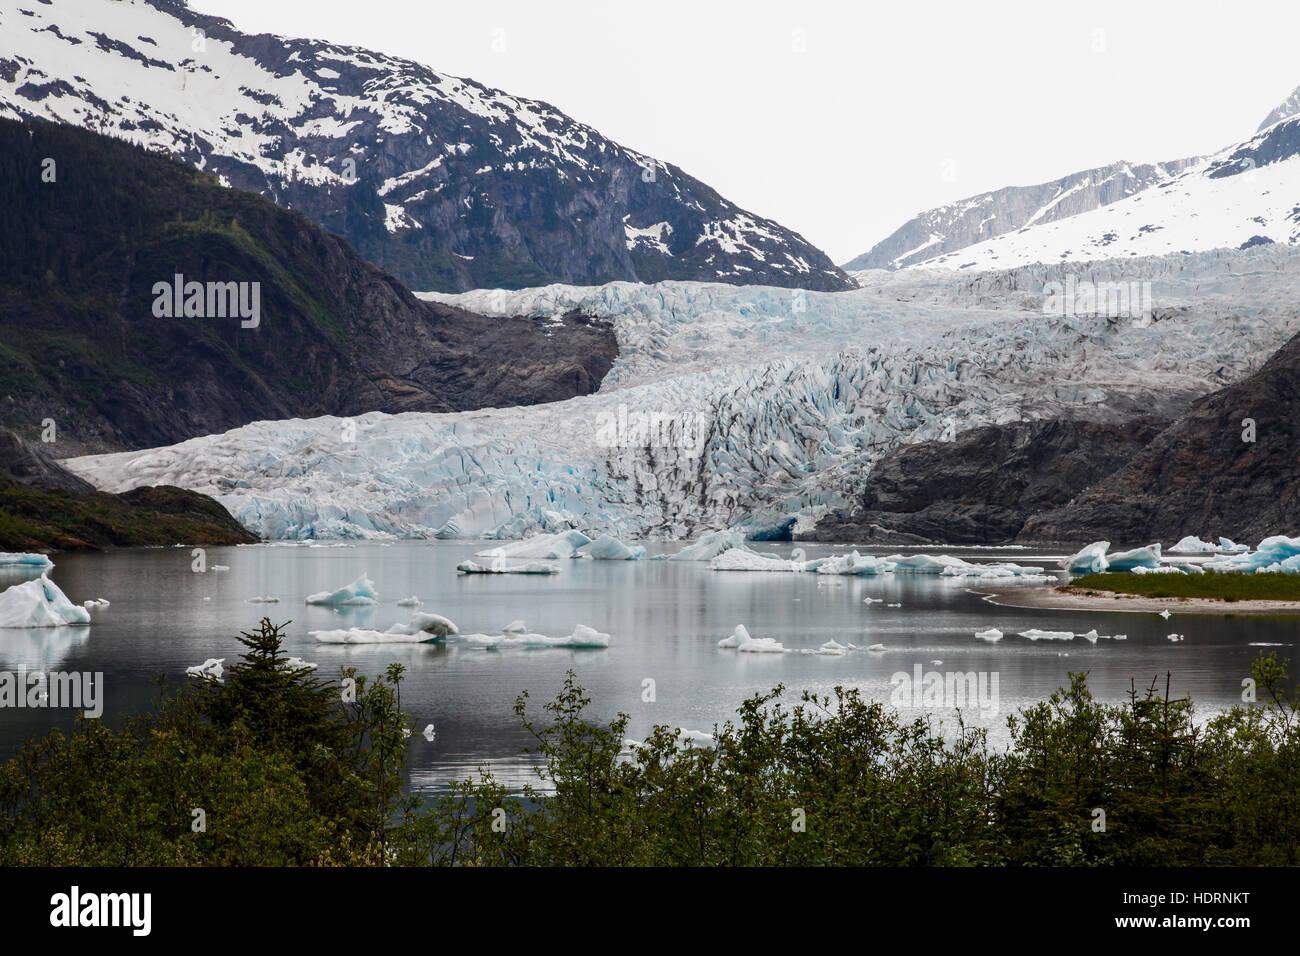 Scenic view of Mendenhall Glacier and lake, Juneau, Southeast Alaska, USA - Stock Image